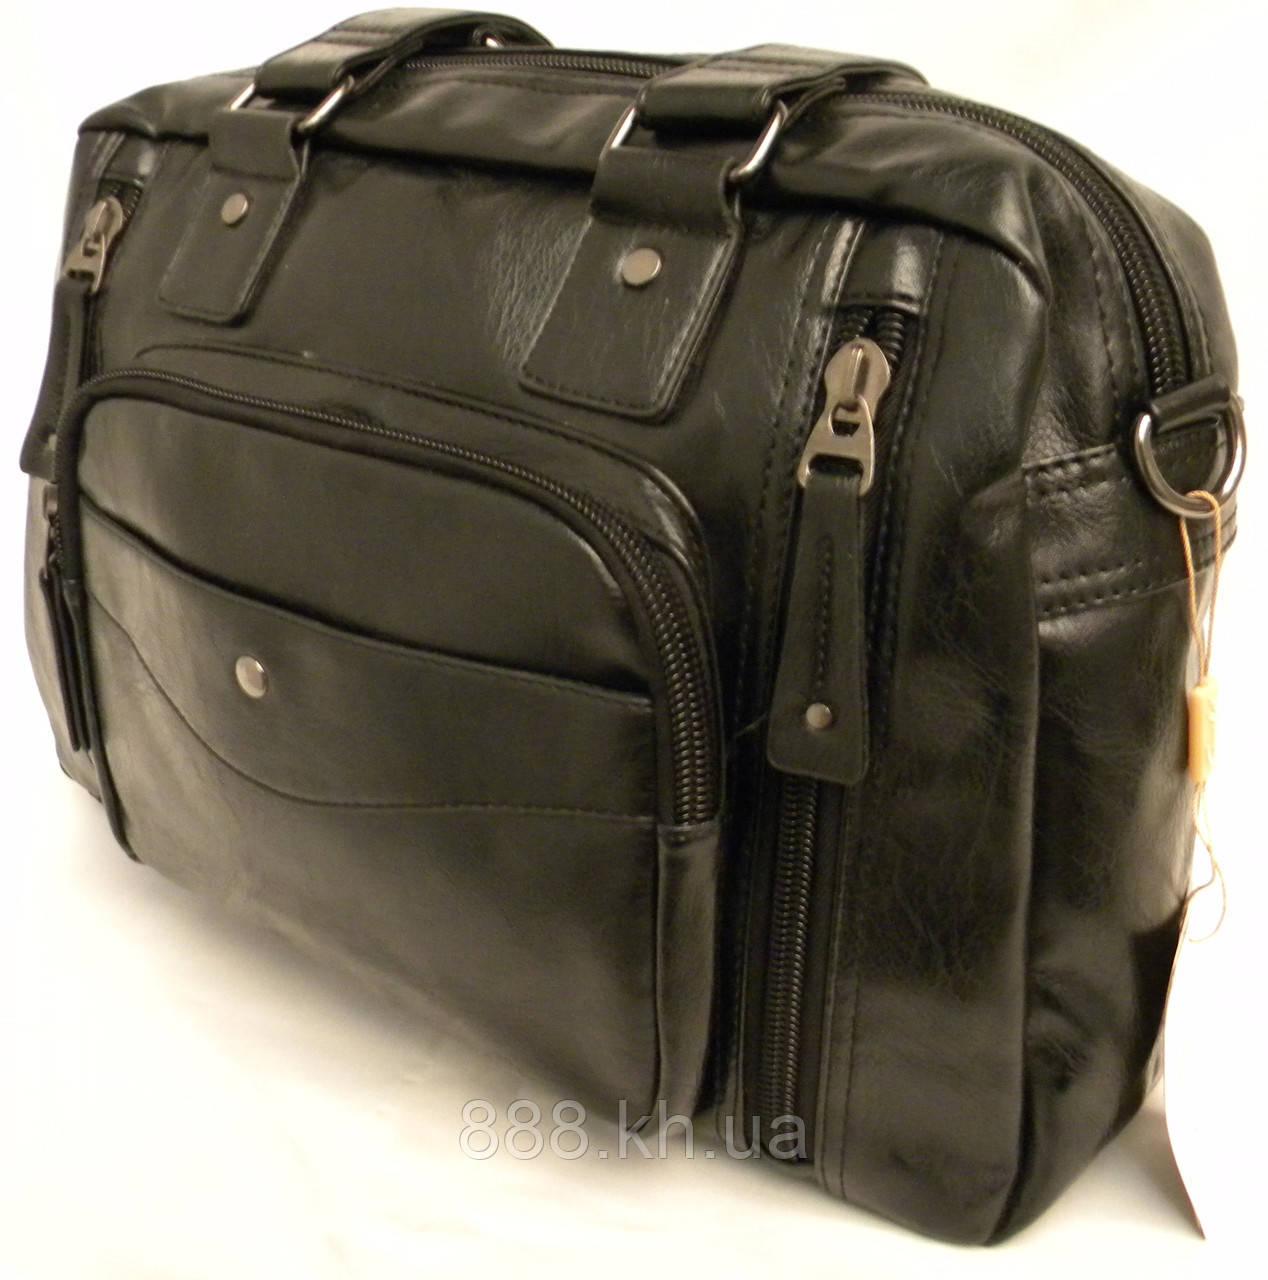 2d5fefbf74ef Кожаная мужская сумка, дорожная мужская сумка, городская сумка, прочная  сумка, сумка для